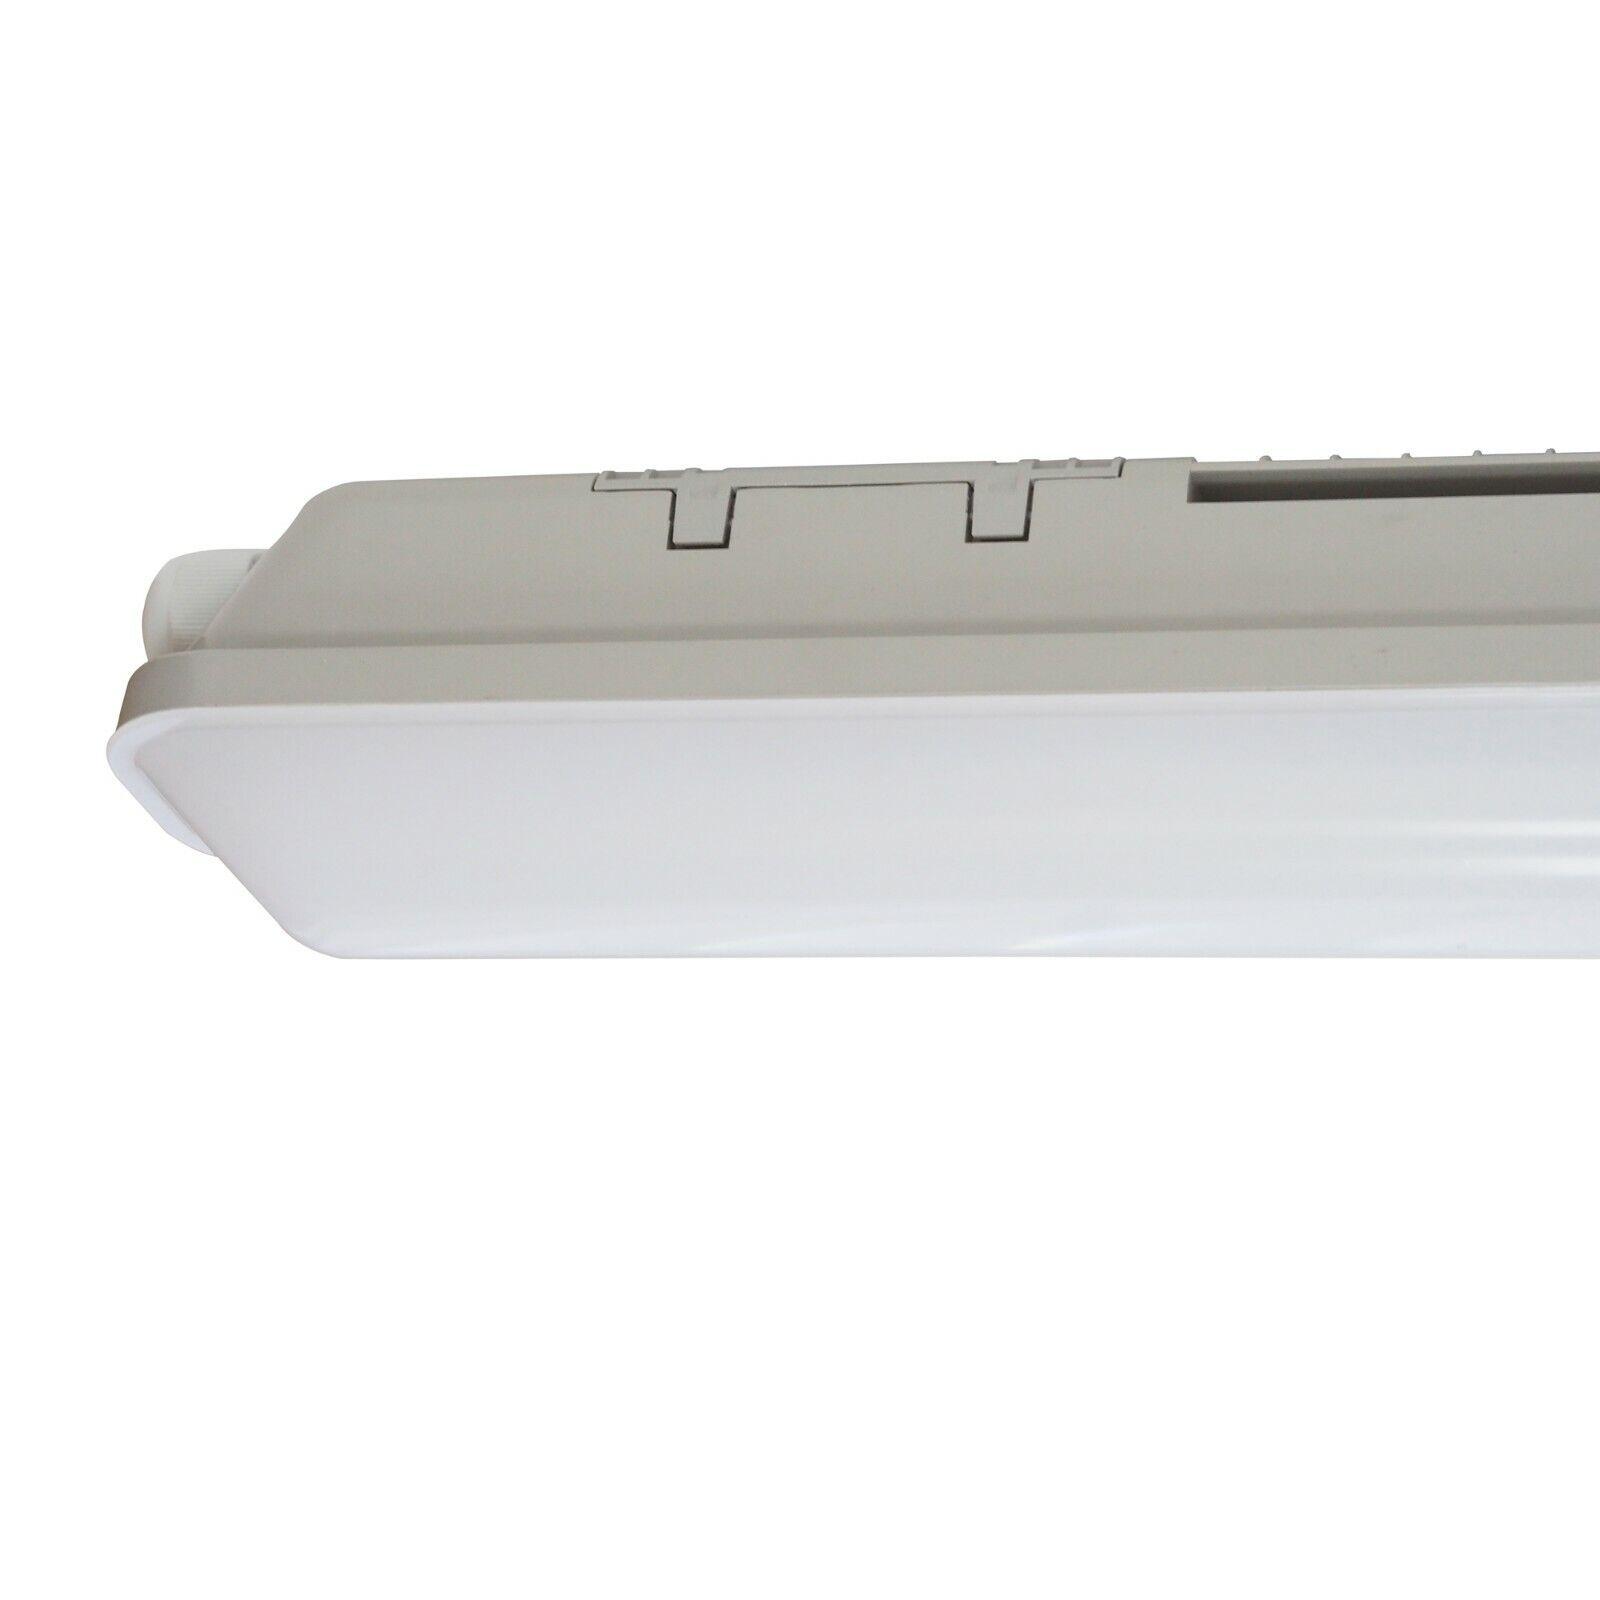 LED 4ft Anti Corrosive IP65 Industrial Batten 20 Watt 4000K Commercial Light x 6